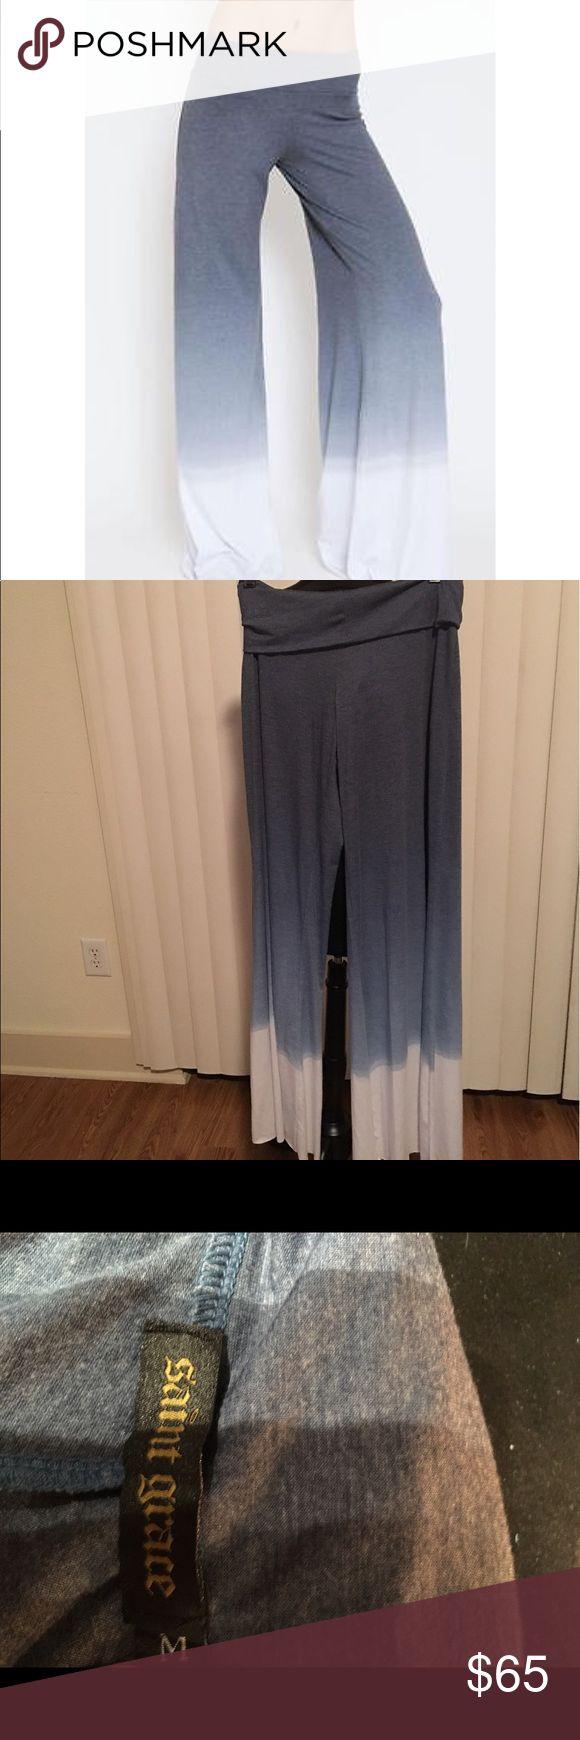 Saint Grace Carol Wide Leg Pant Ombré Medium Never worn, super comfy Saint Grace Wide Leg Pant! Blue/ white ombré, raw bottom hem. 62% polyester, 32% rayon, 6% Lycra with fold over waist. Saint Grace Pants Wide Leg